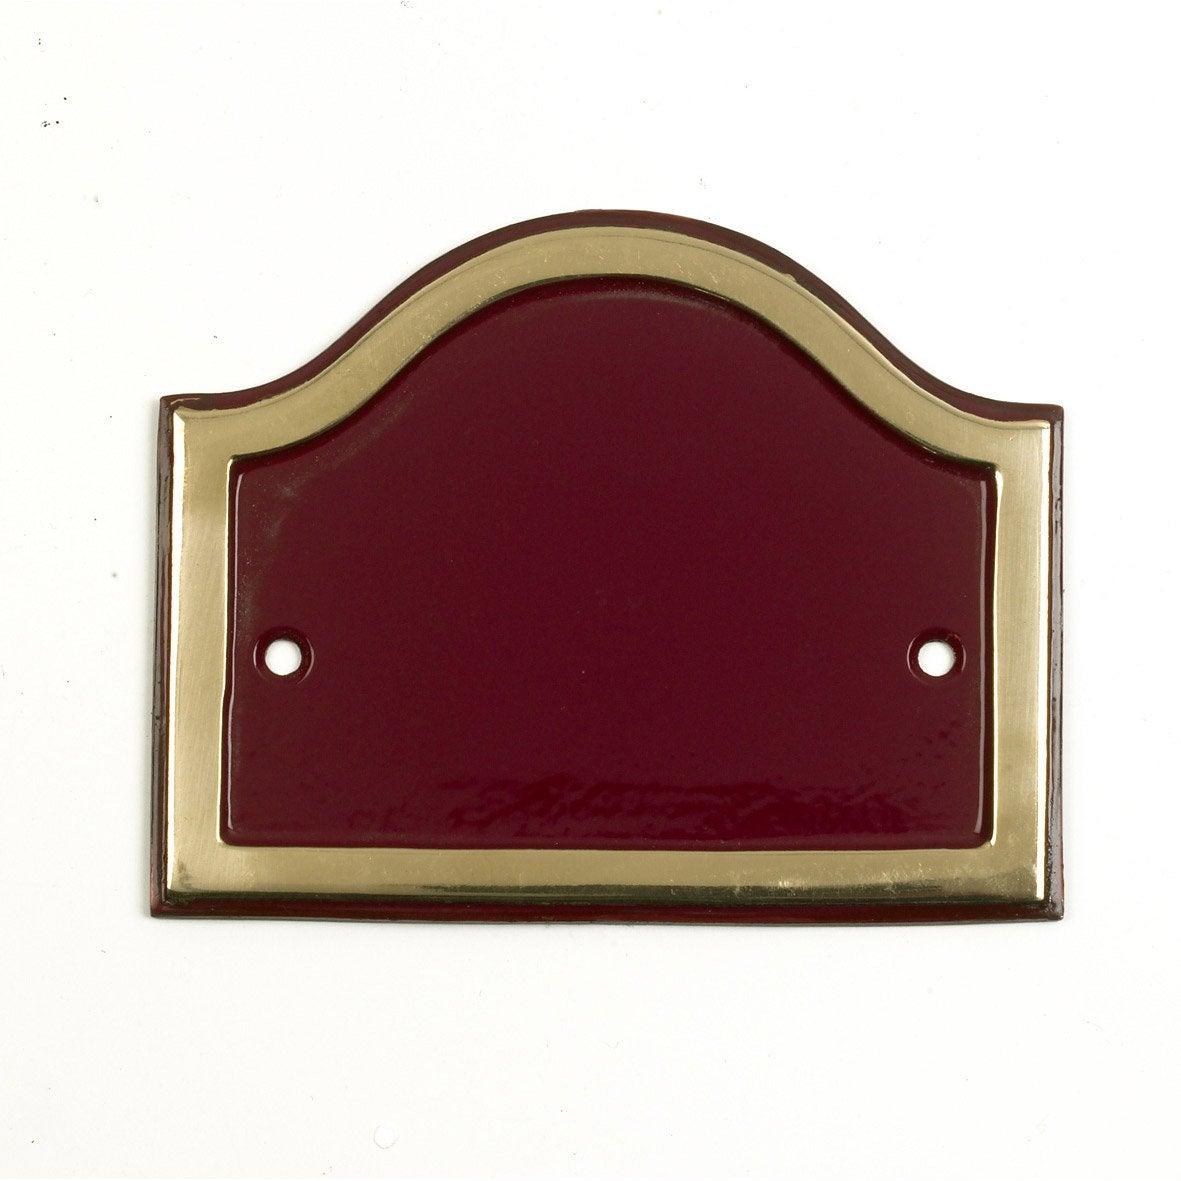 plaque arche en laiton leroy merlin. Black Bedroom Furniture Sets. Home Design Ideas